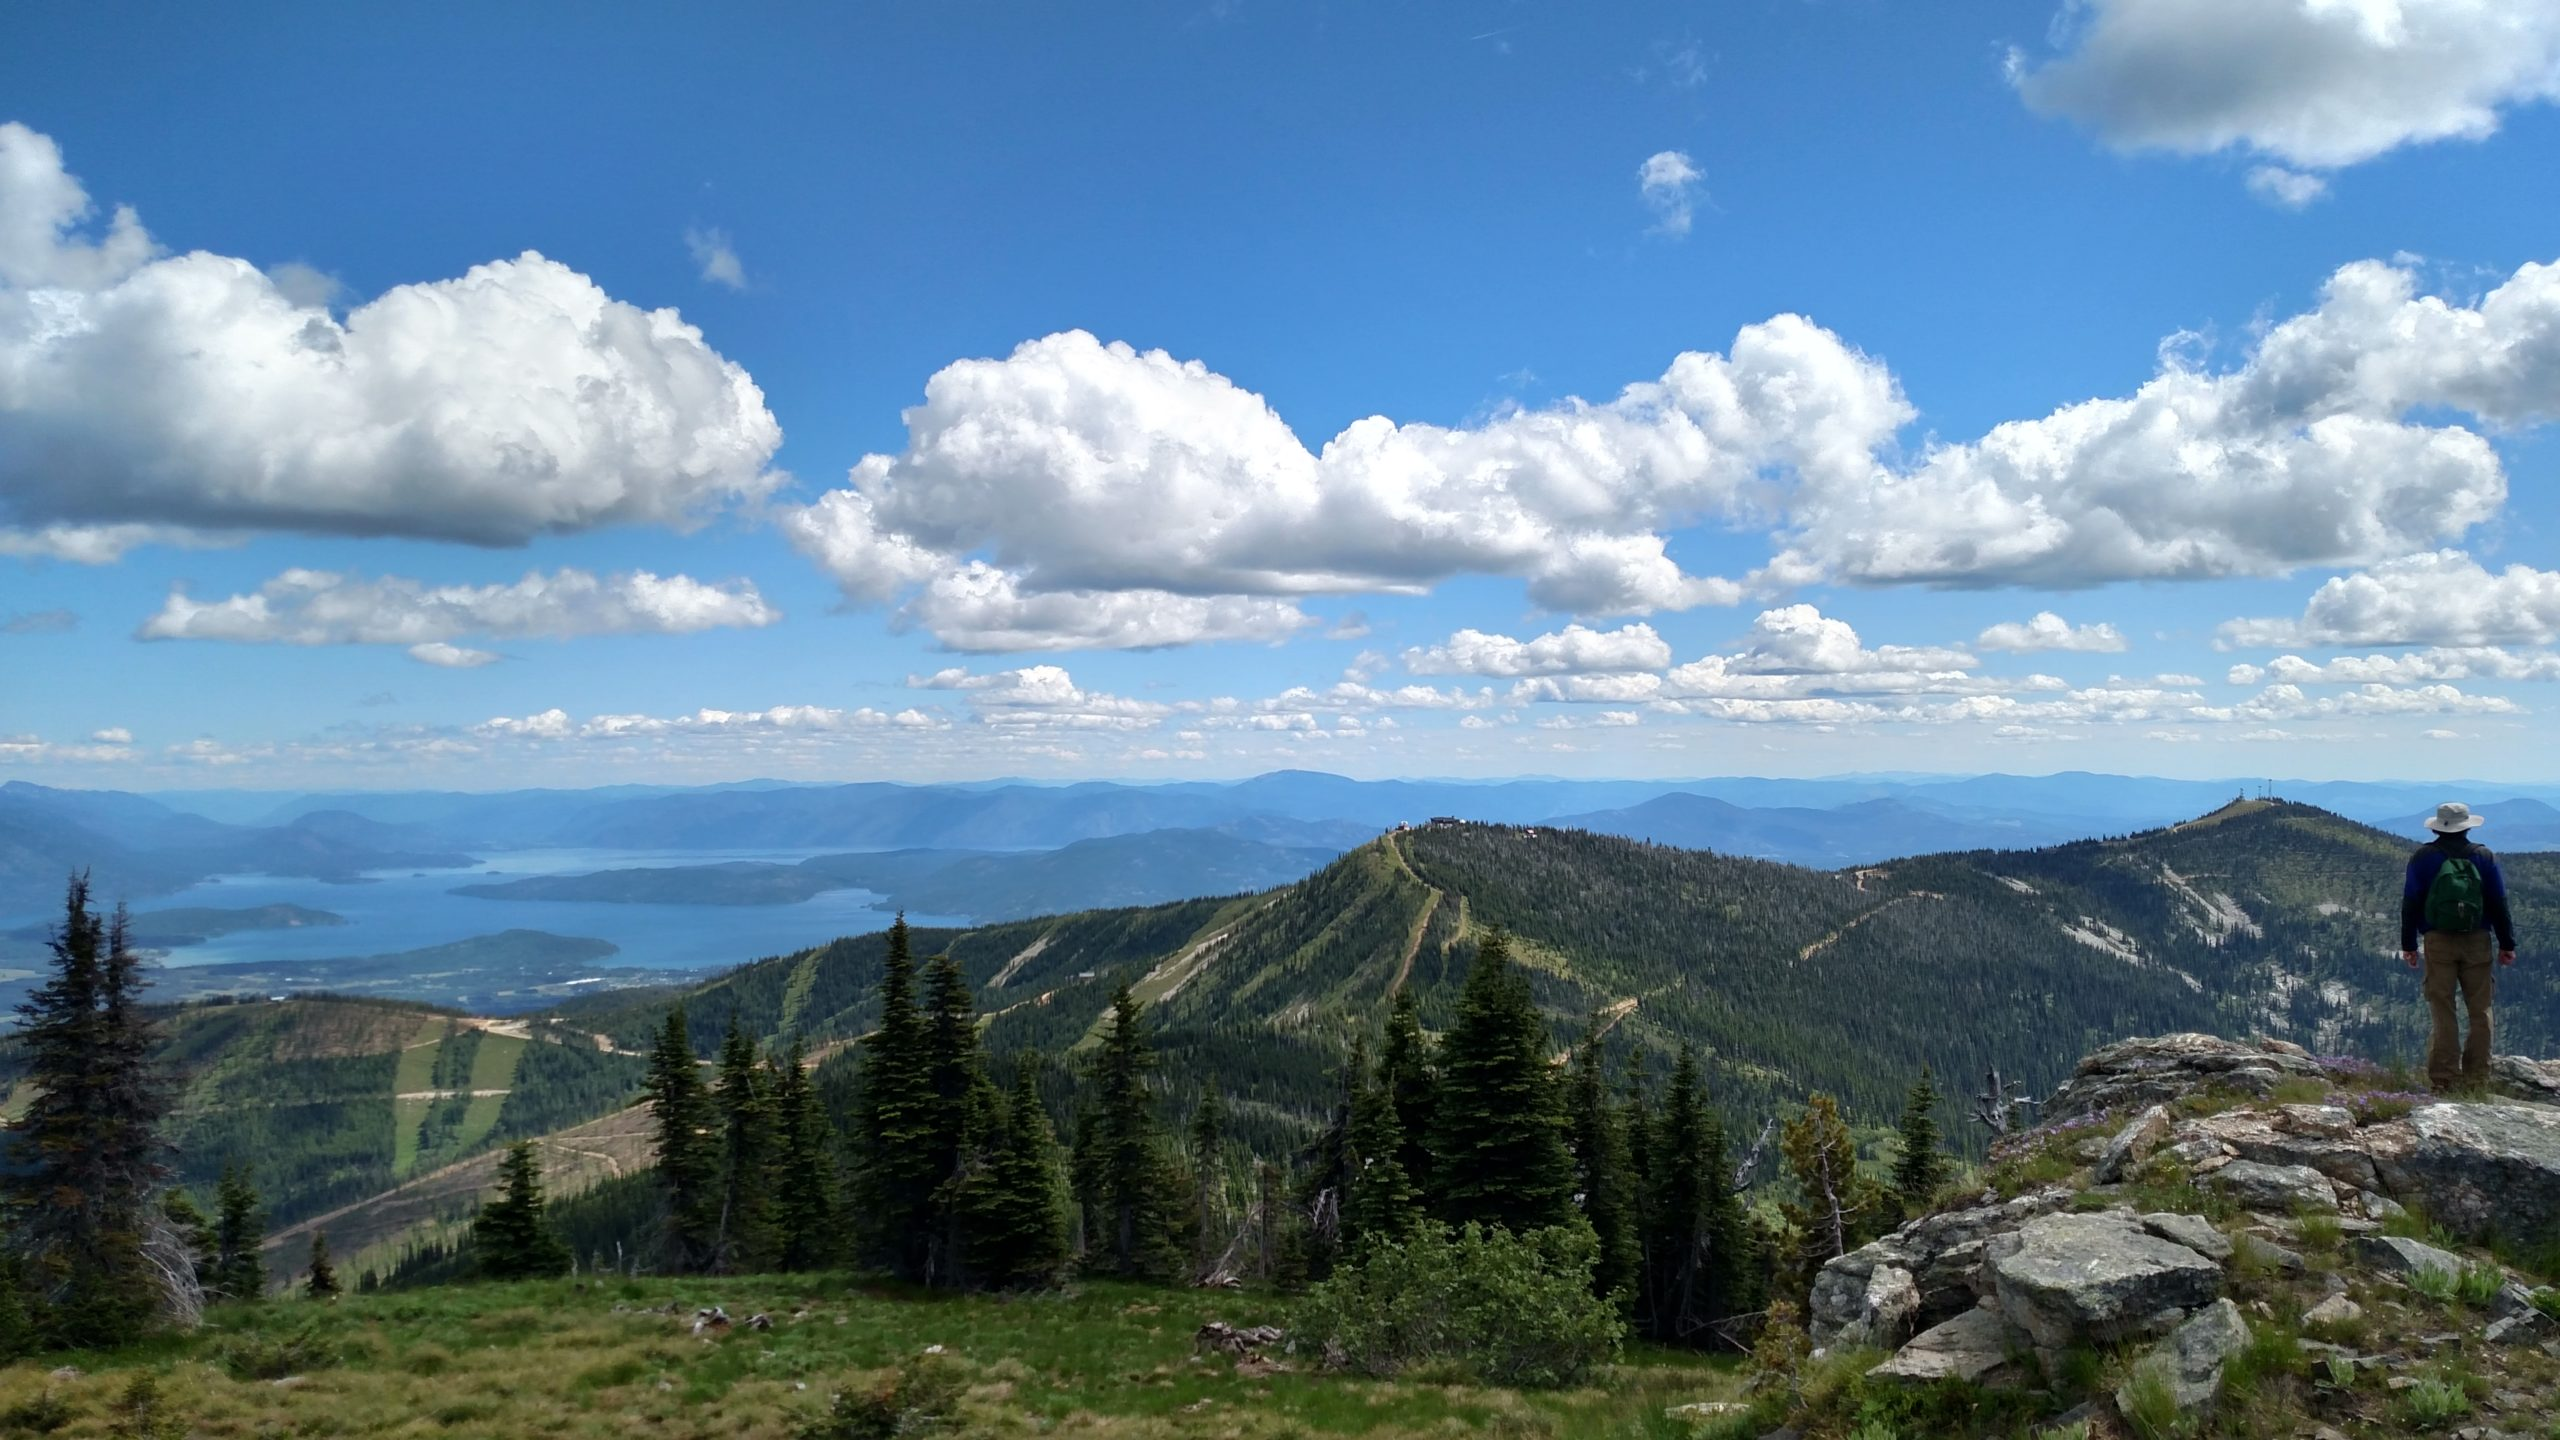 view of Schweitzer Mountain from Big Blue peak